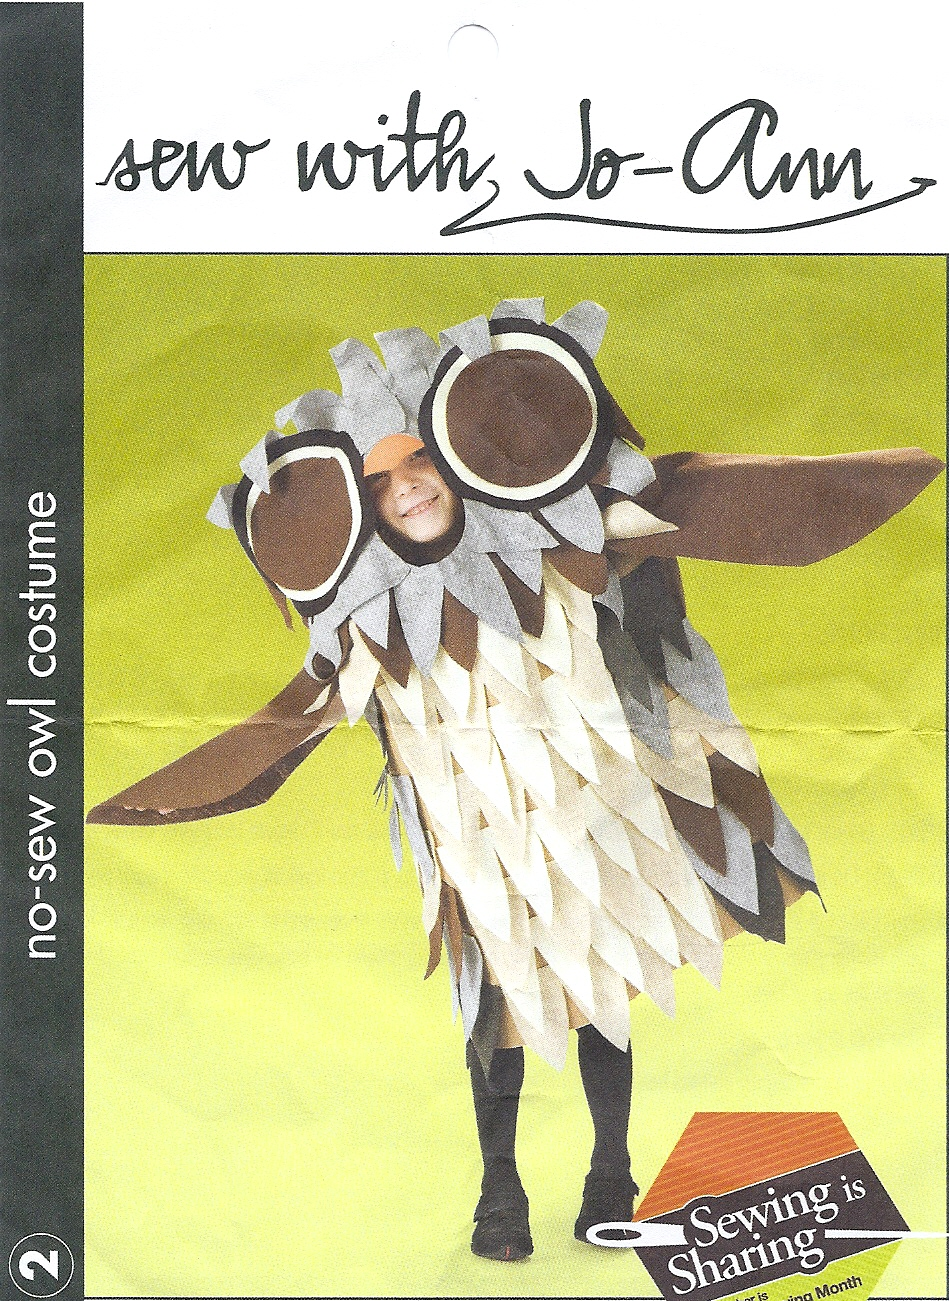 Felt Owl Costume by CeshionCo